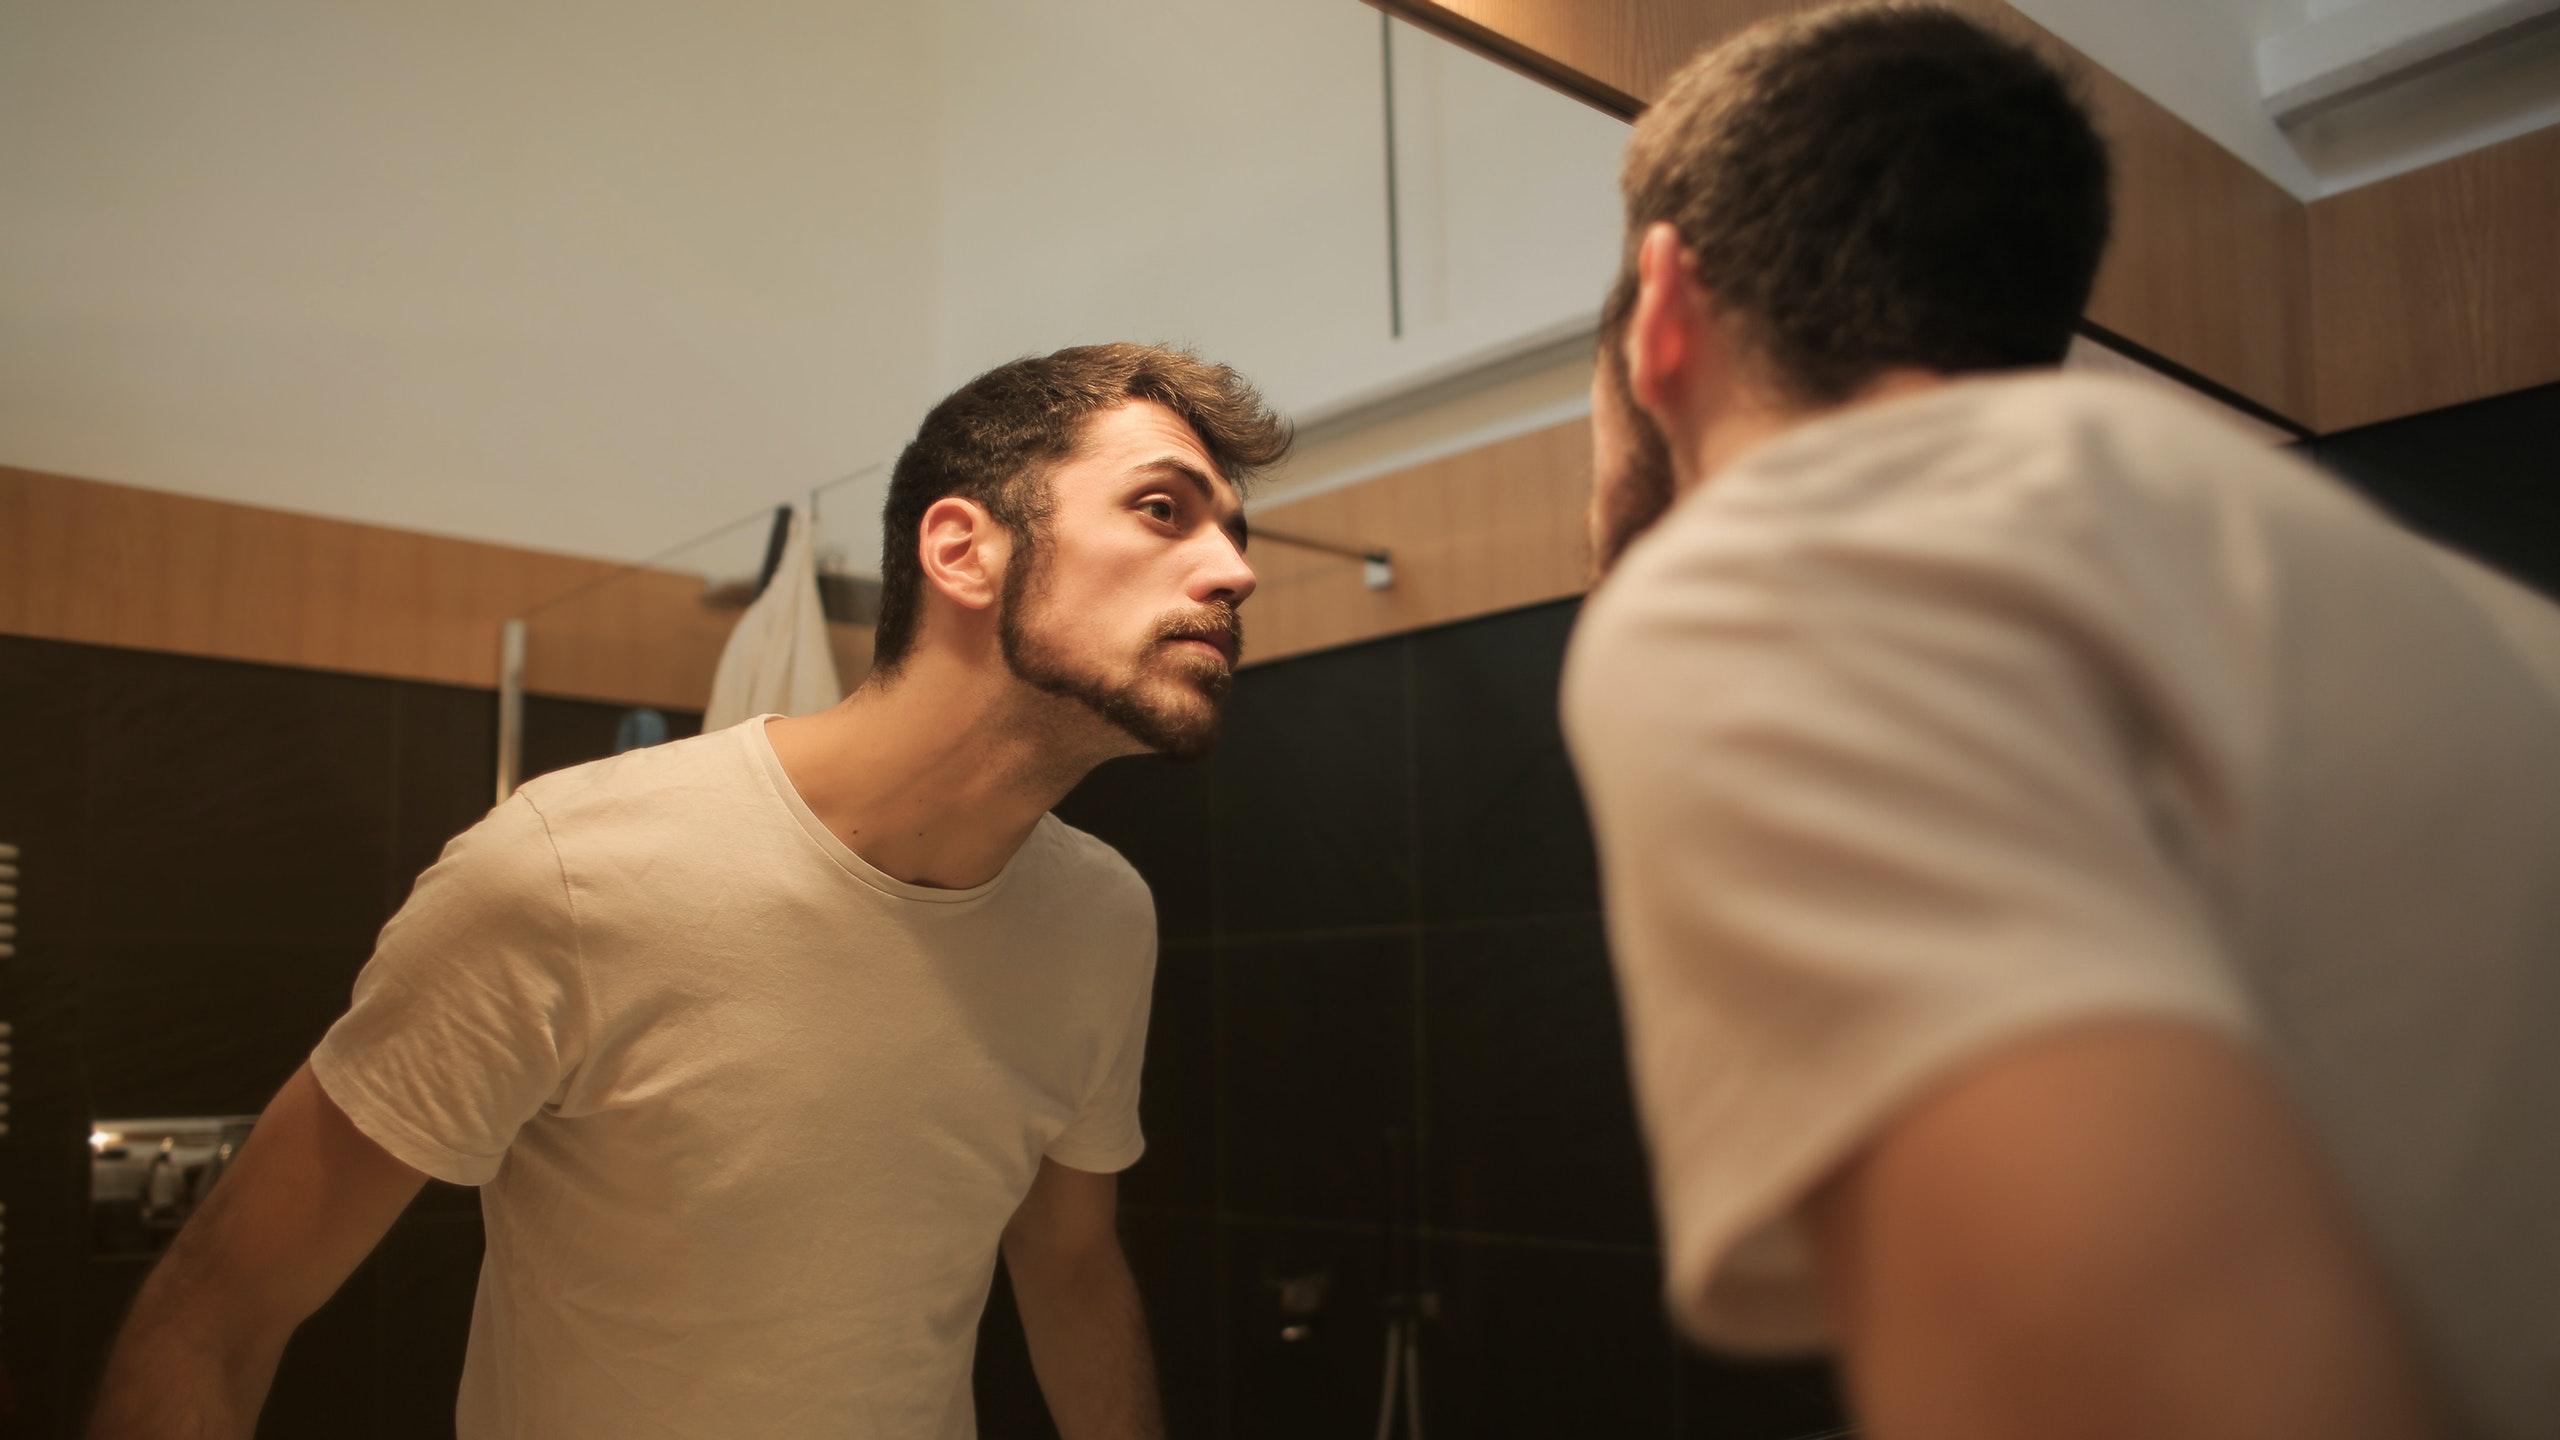 lumin men's skincare